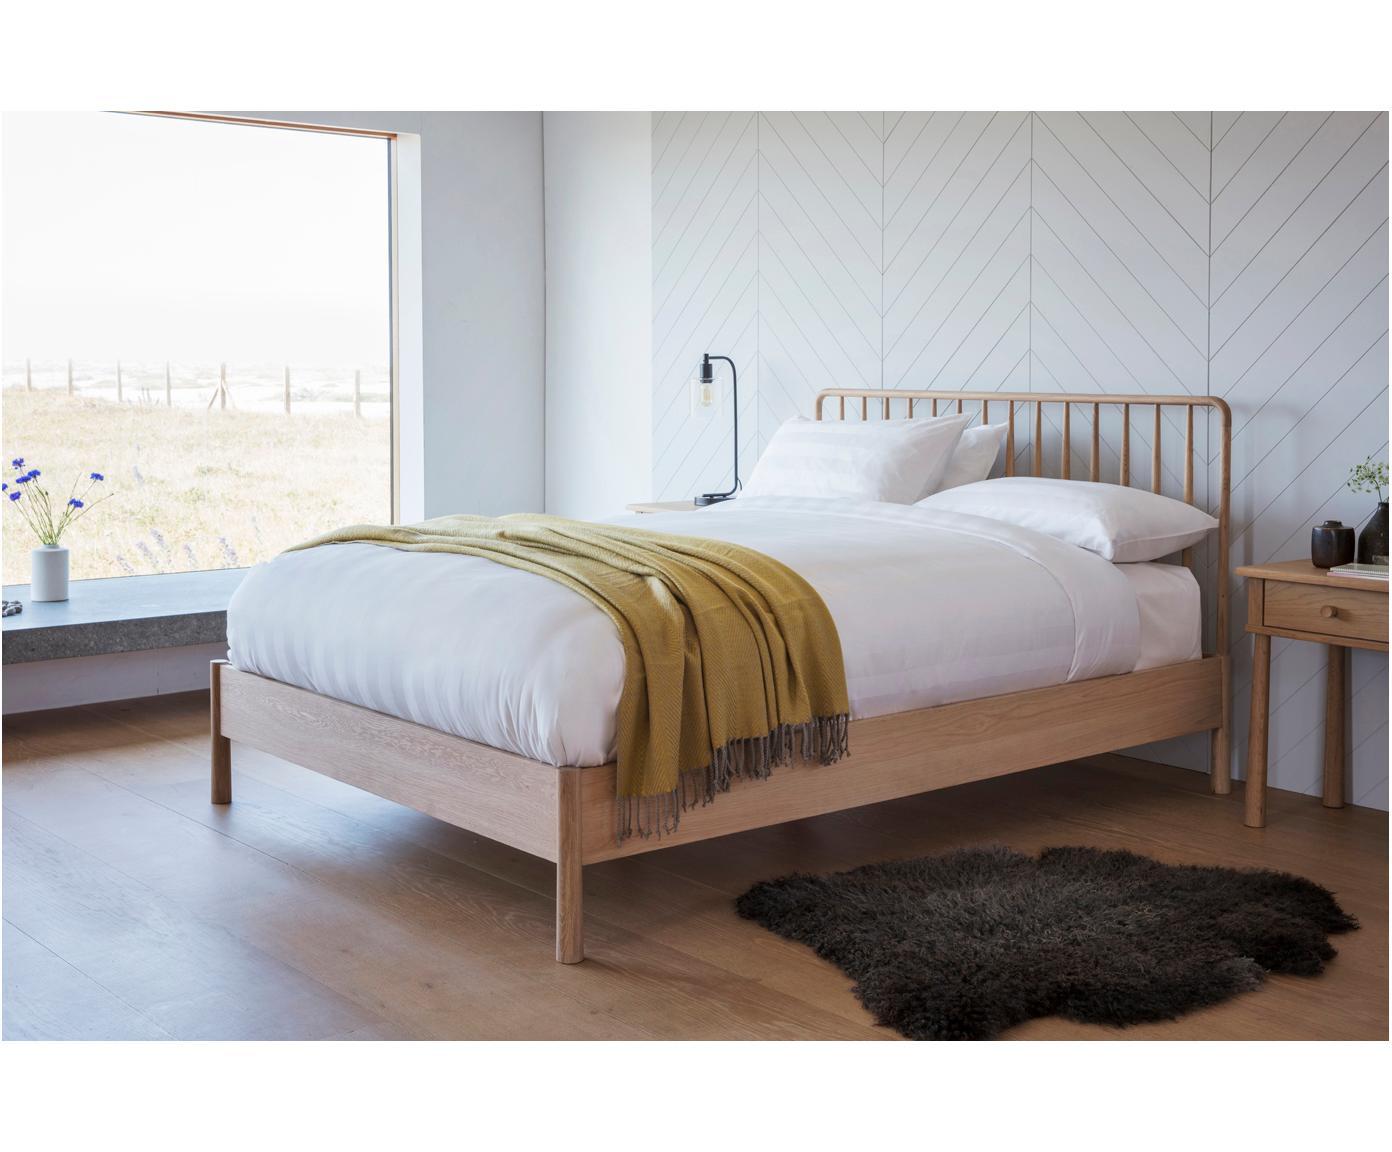 Bett Wycombe aus Eichenholz